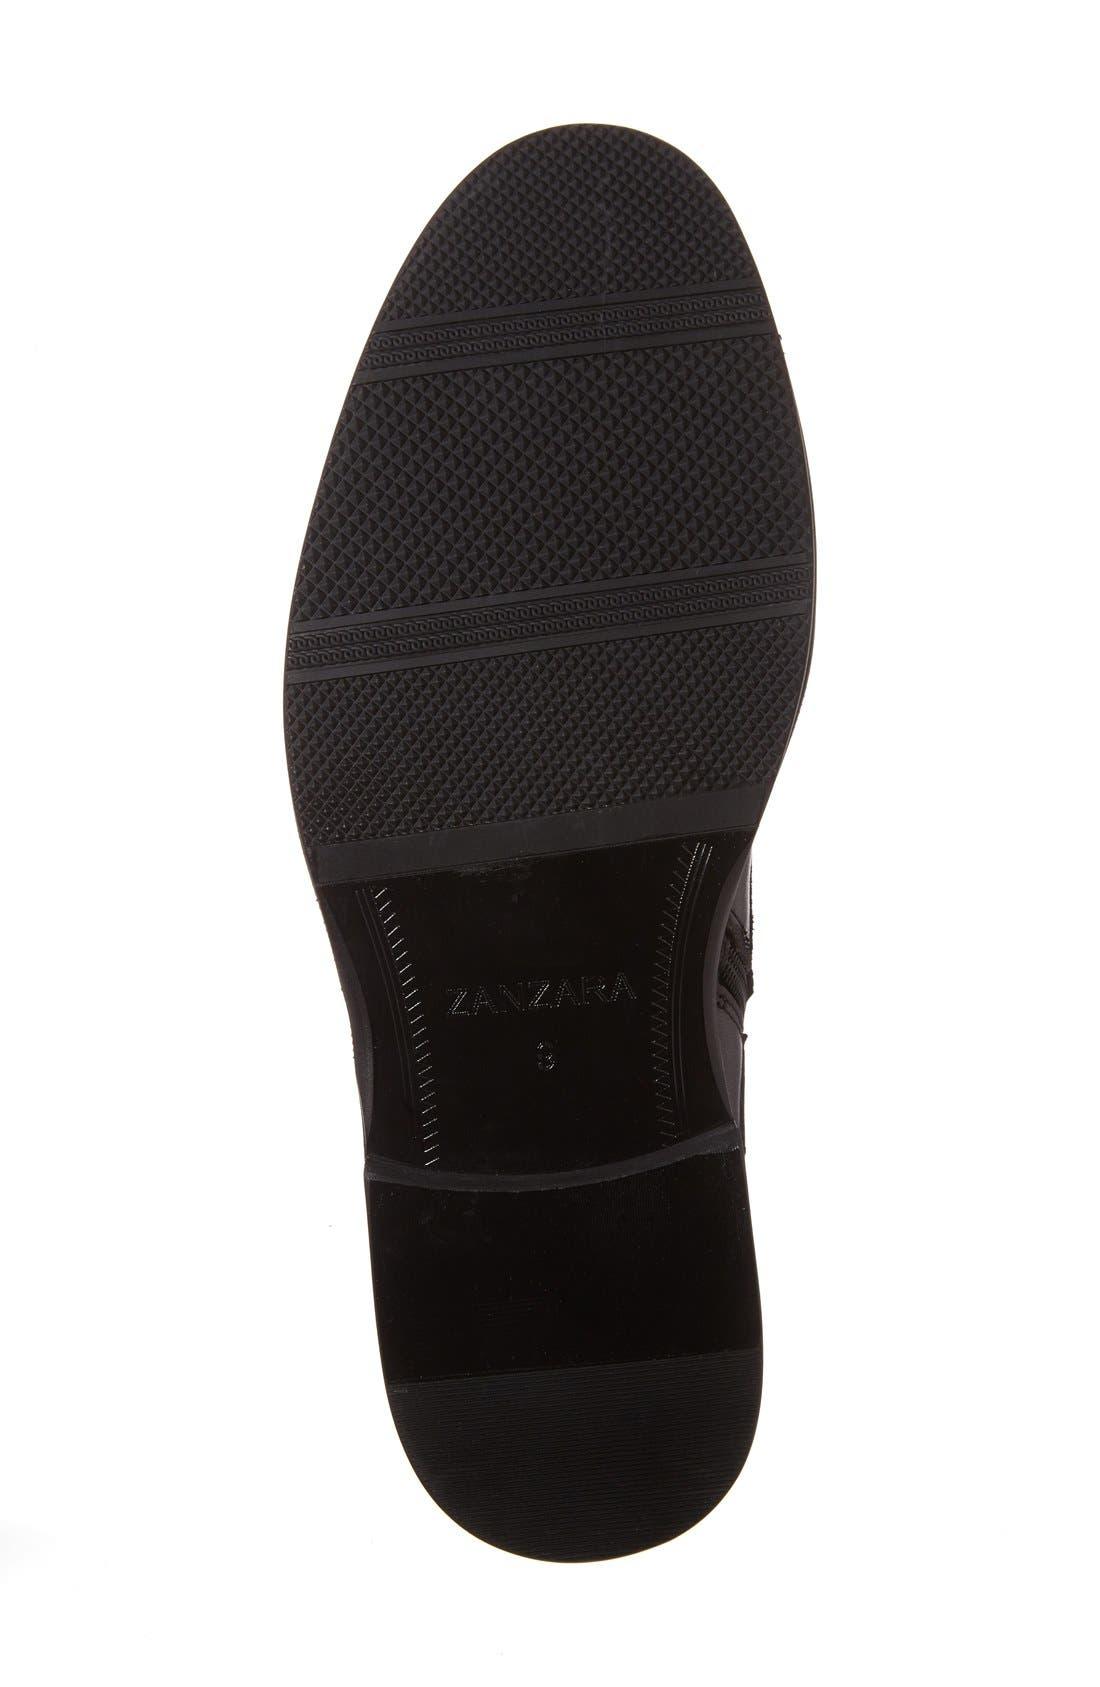 Alternate Image 4  - Zanzara 'Verona' Midi Studded Boot (Men)